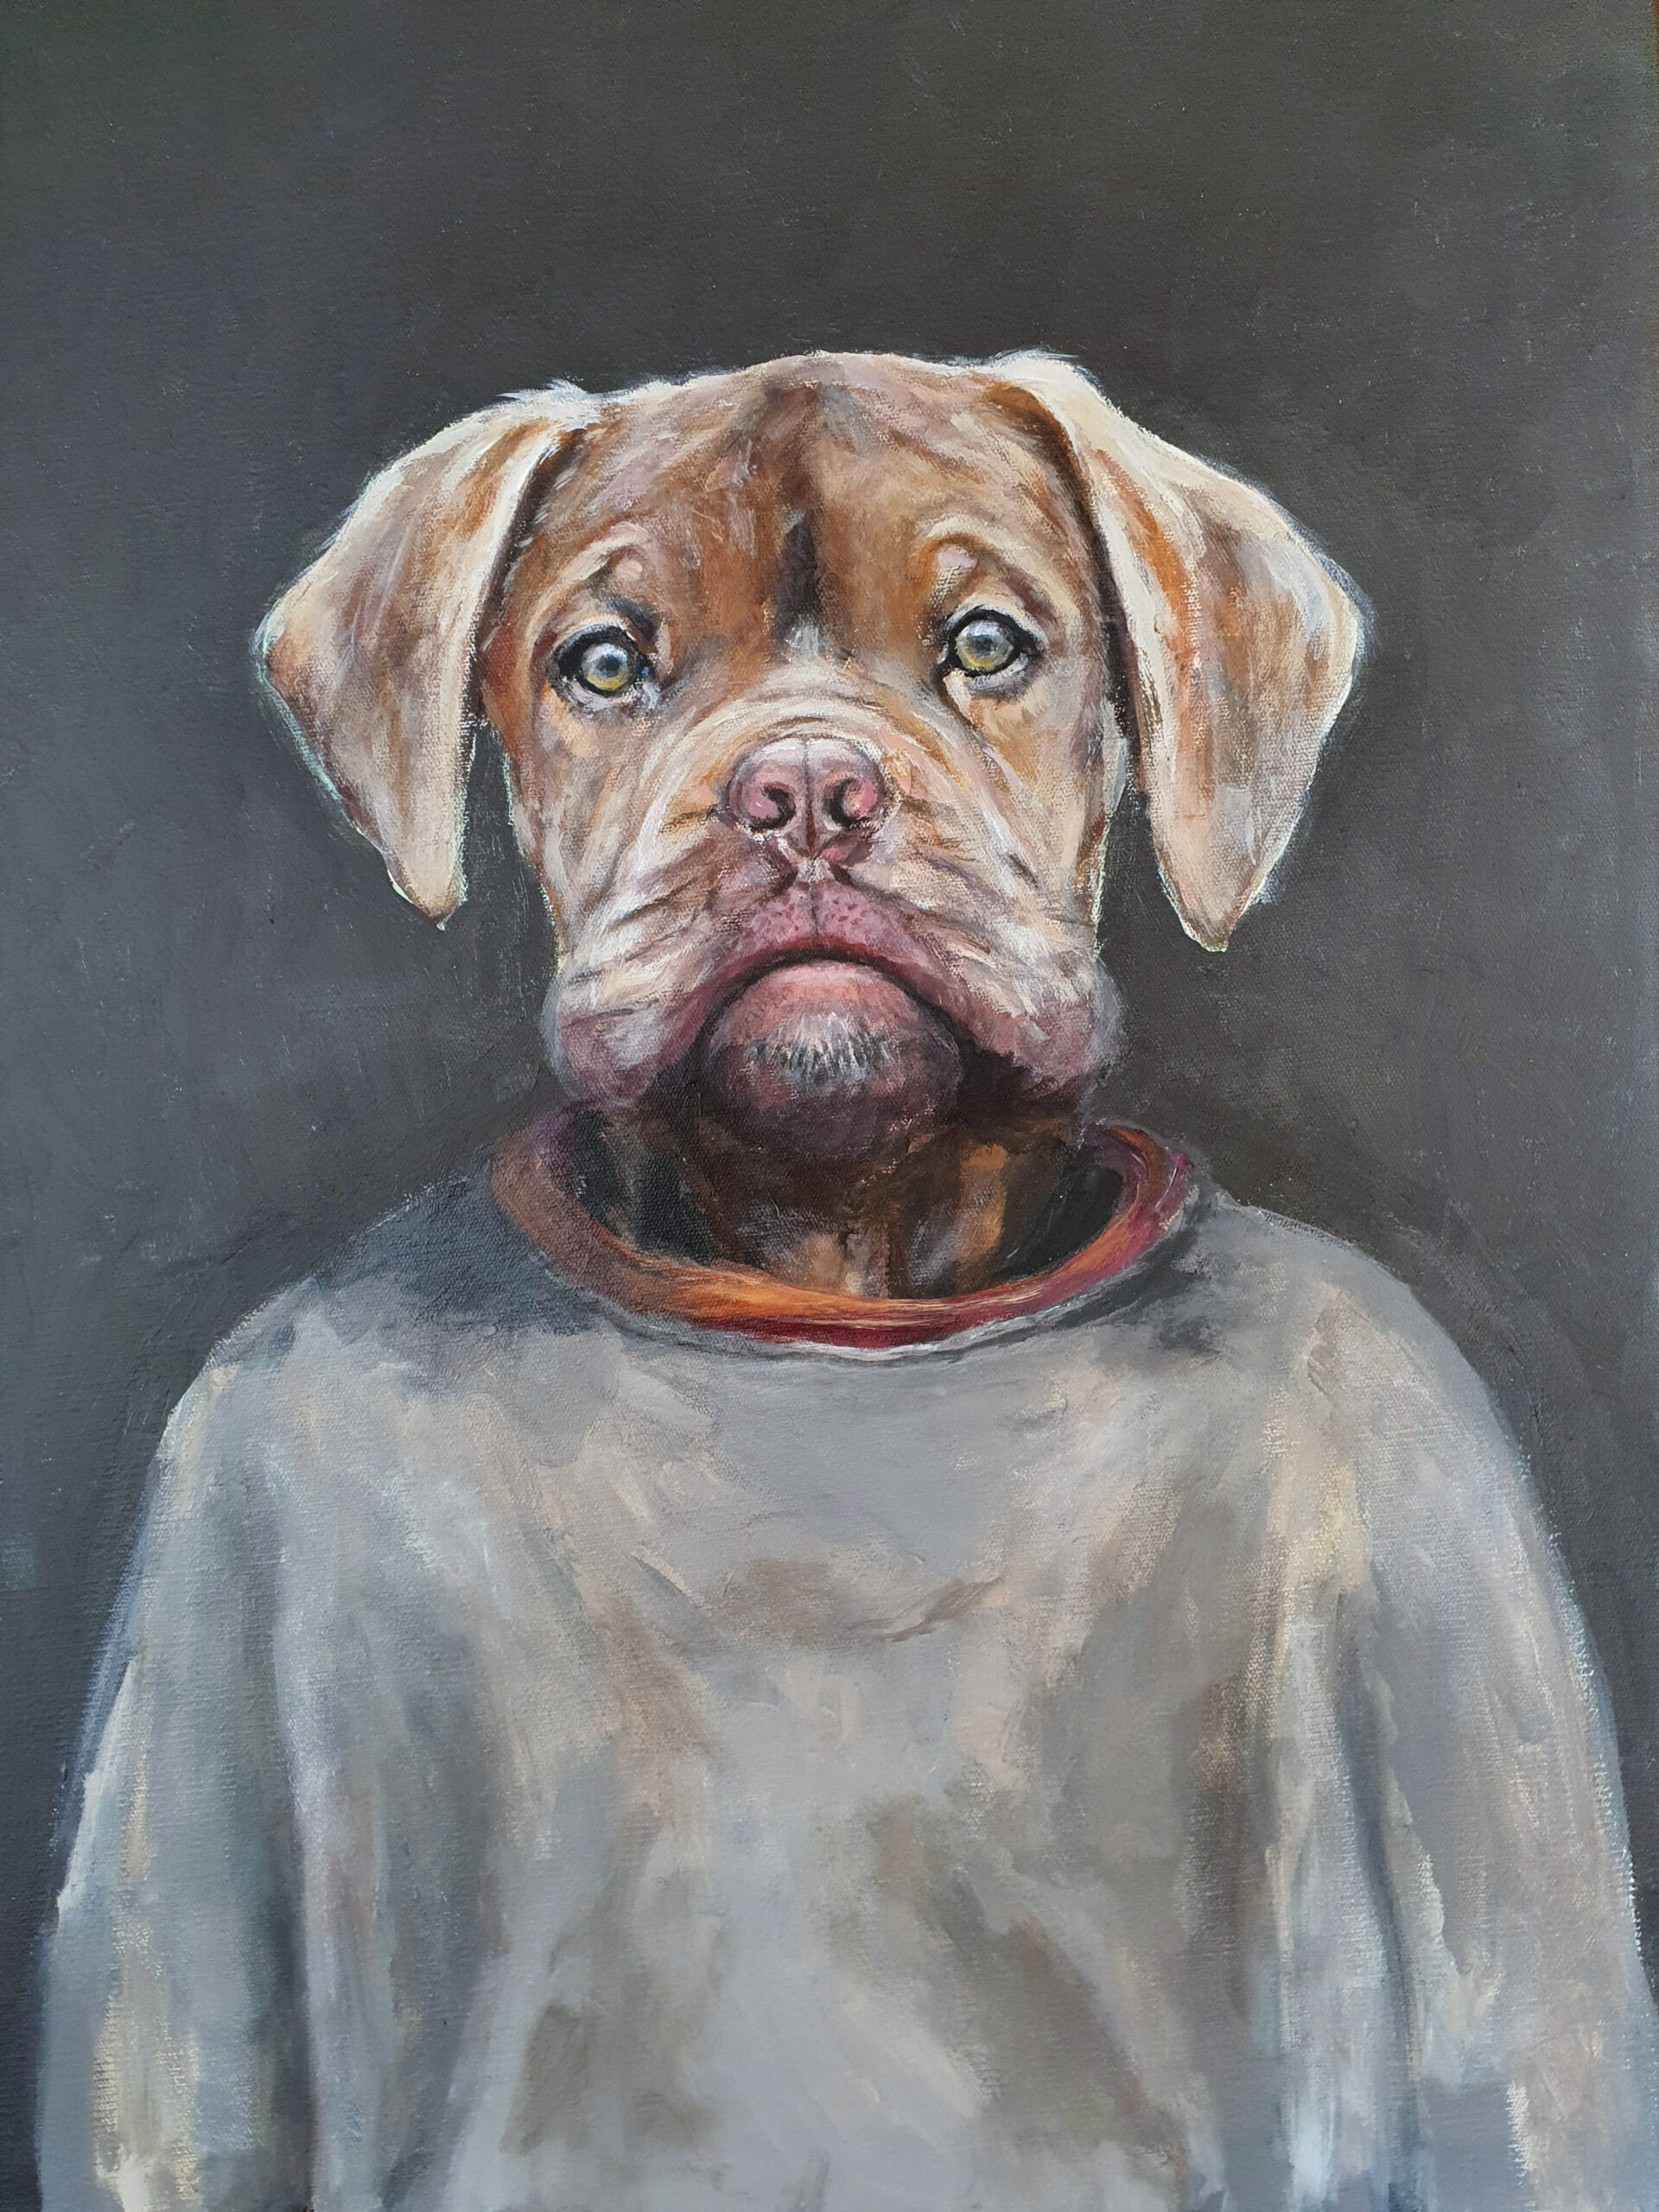 © Emmy Harnes Emmy Harnes billedkunstner billedkunst Haslum Bærum kunstner figurativ kunst antropomorfisk eventyrlig artist art anthropomorphicart